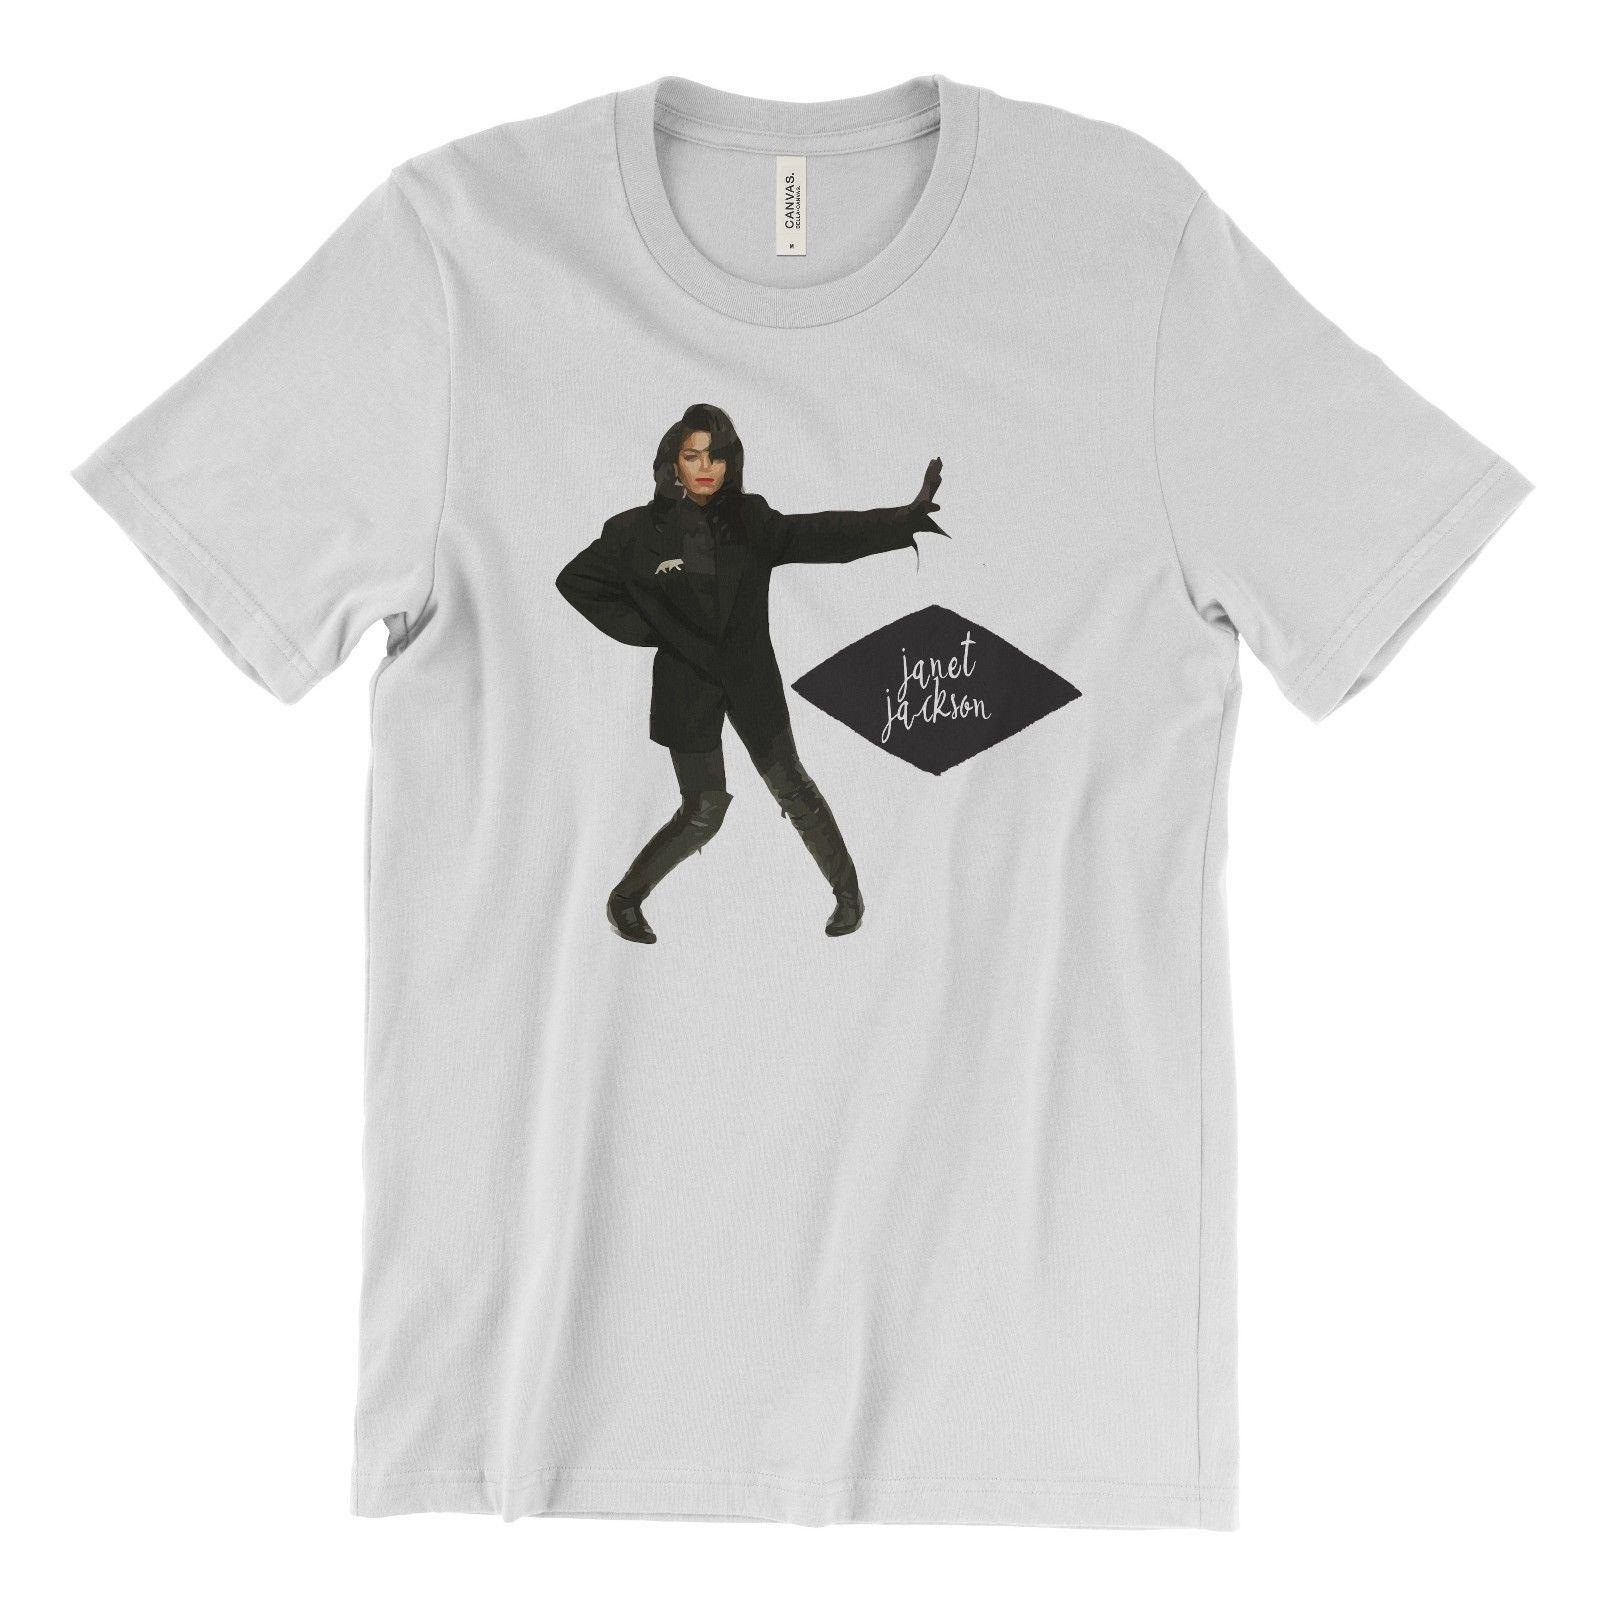 2e81f5a8 Janet Jackson T-Shirt 90's R&B World Tour Rhythm Nation When I Think of You  white black grey red trousers tshirt